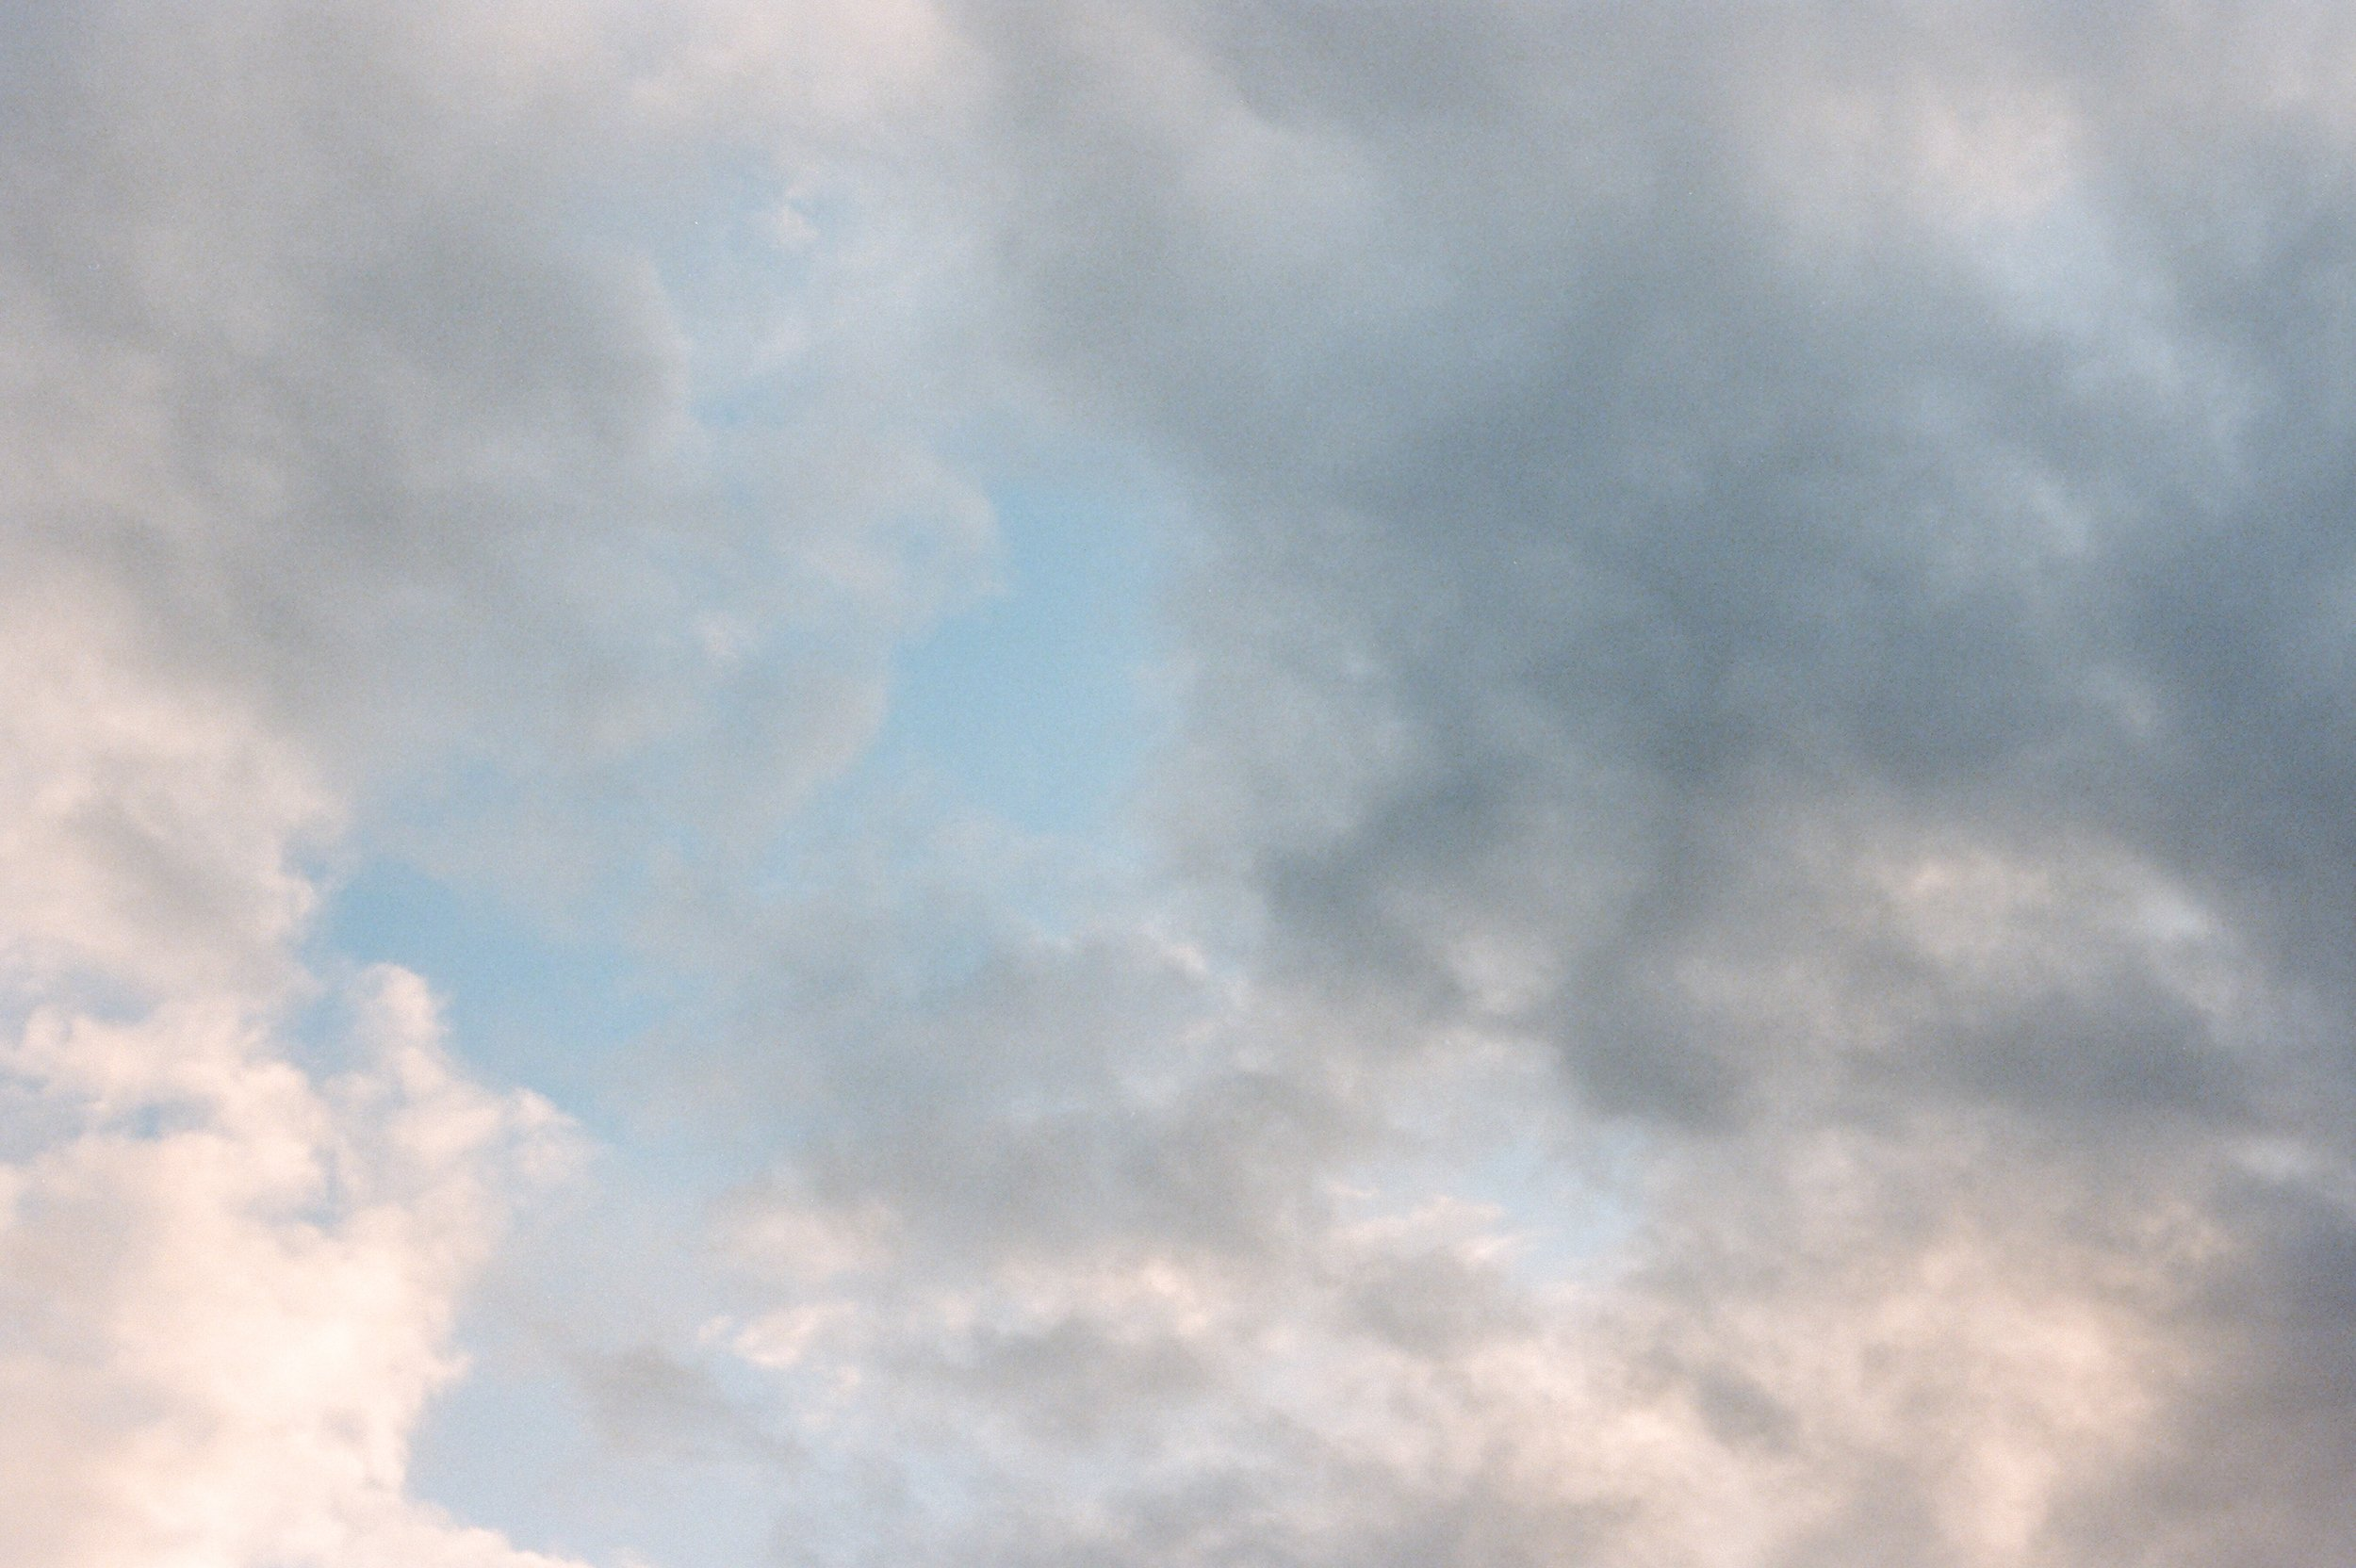 clouds_cloud_film_photographer_emily_walker_6.jpg